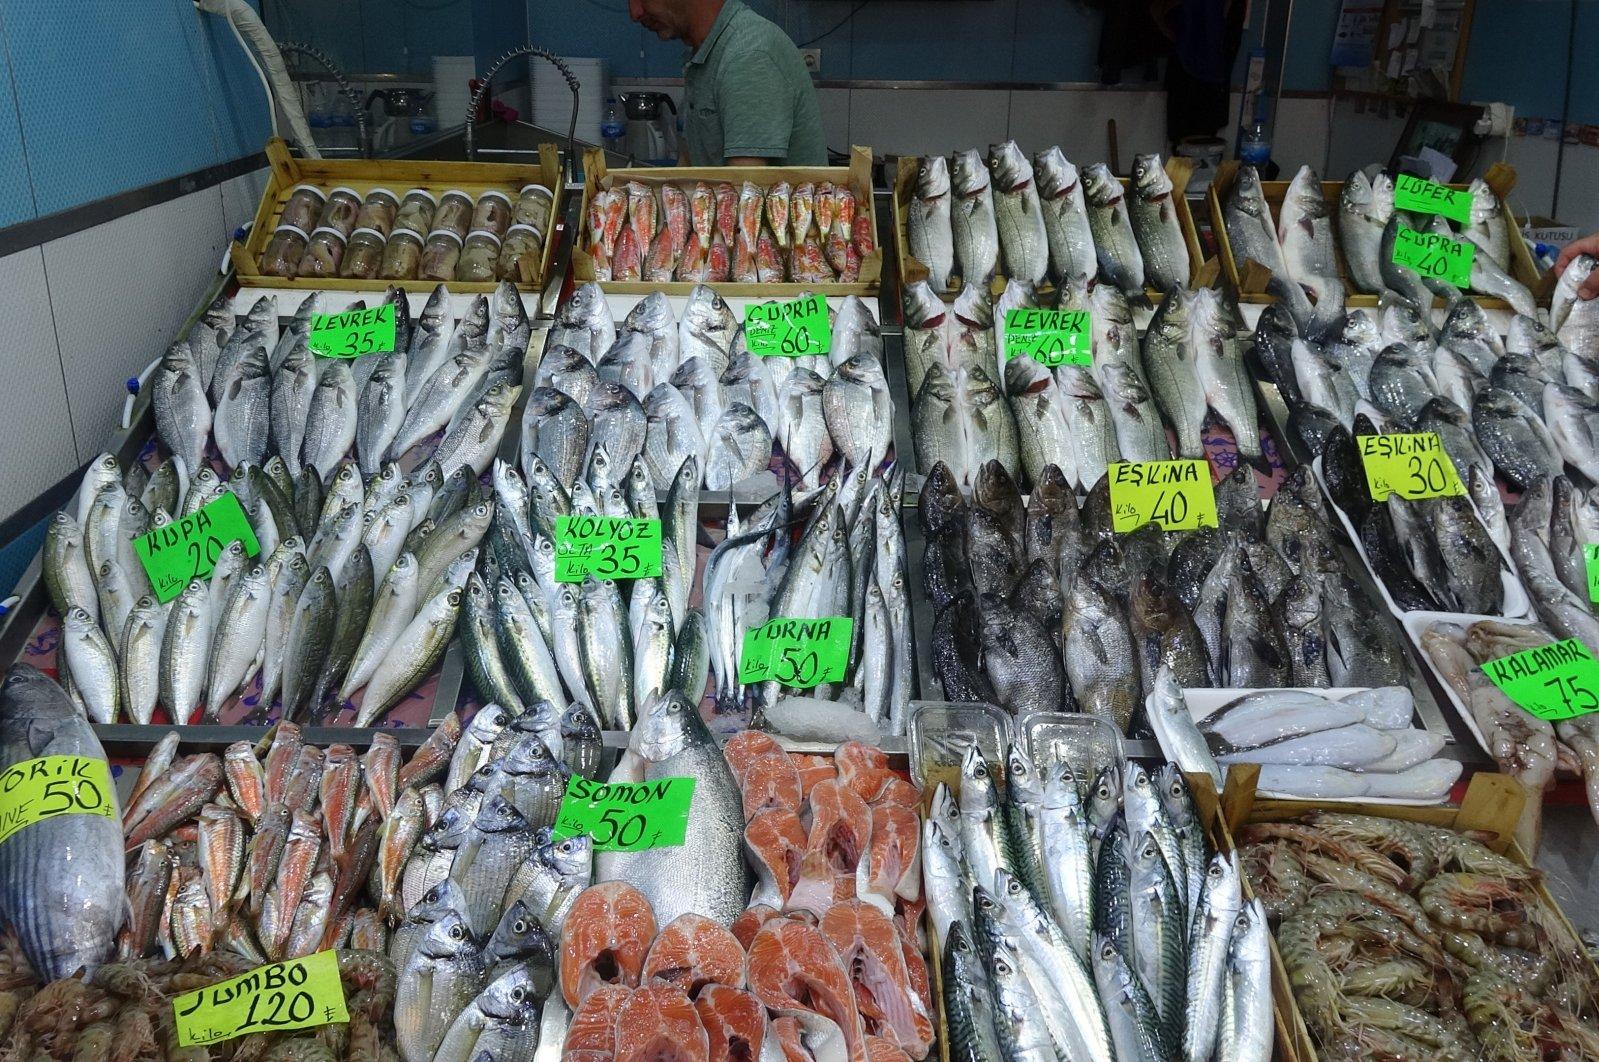 Fish on a stall in a fish market in Çanakkale, Turkey, June 10, 2020. (IHA Photo)